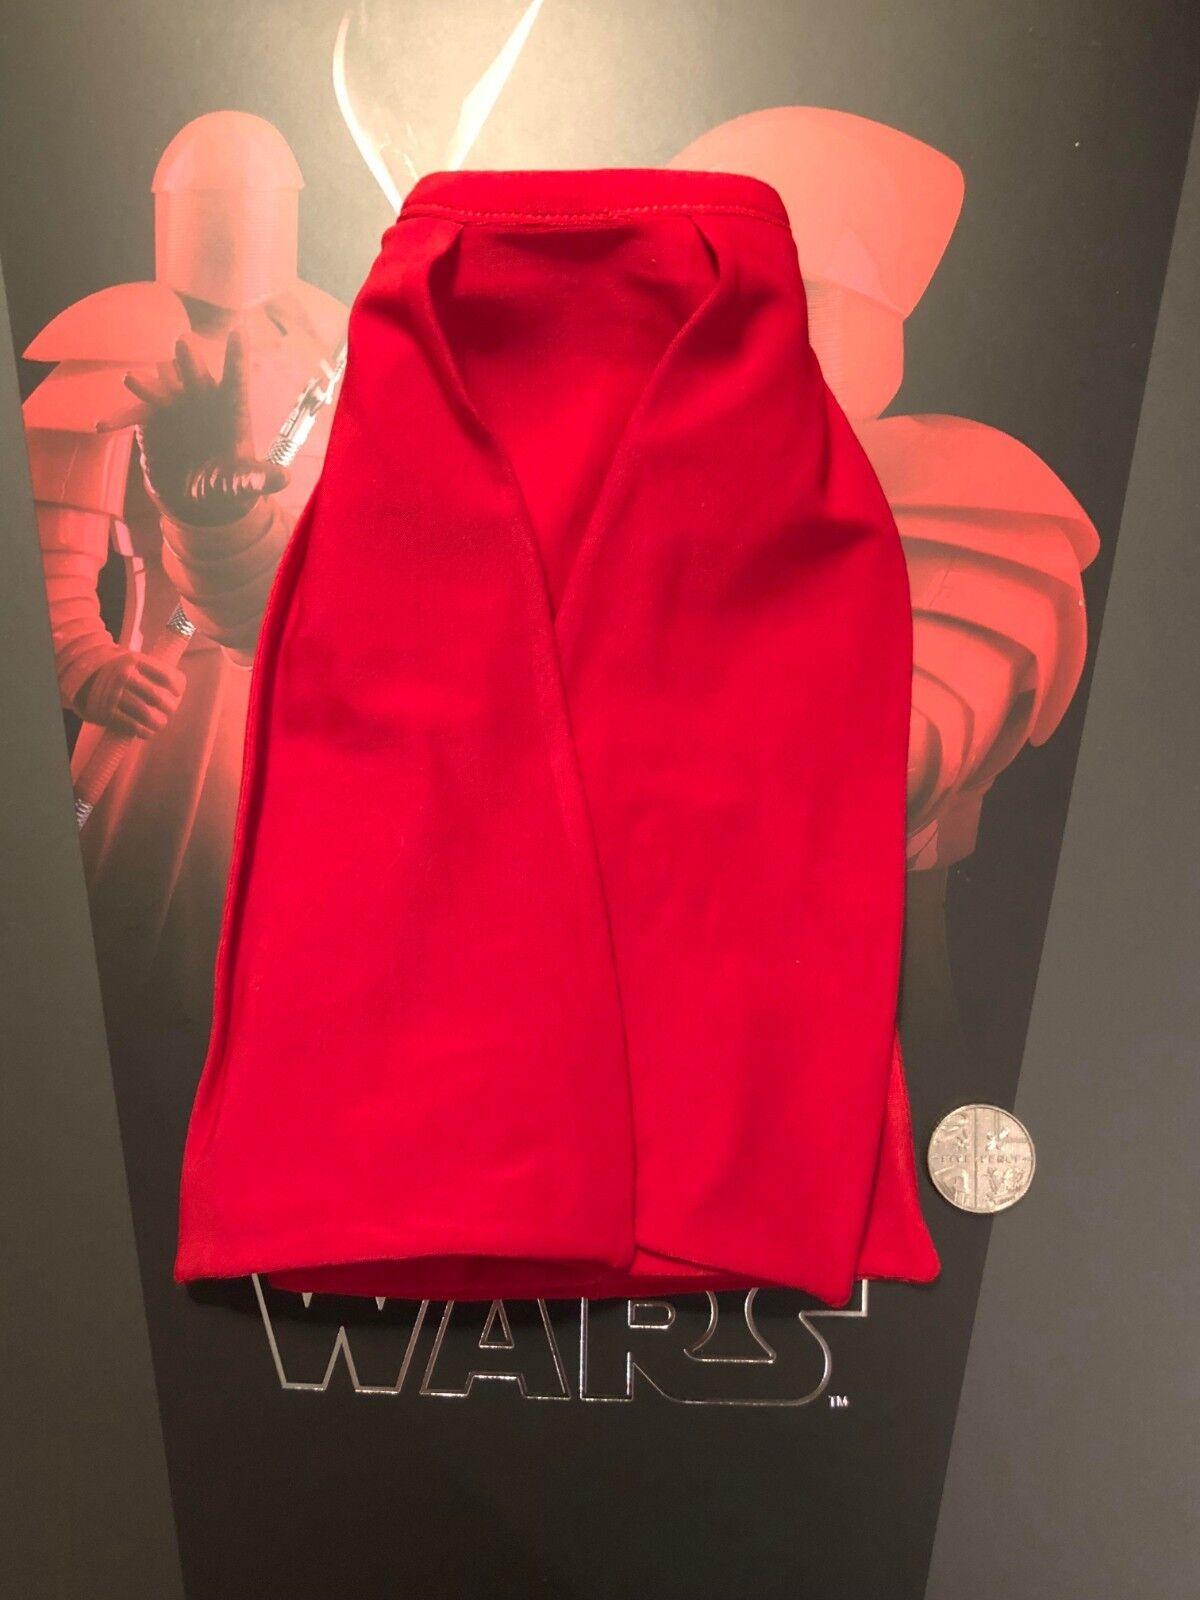 Hot Toys Star Wars Praetorian Guard DB Lower Red Skirt Cloak loose 1 6th scale